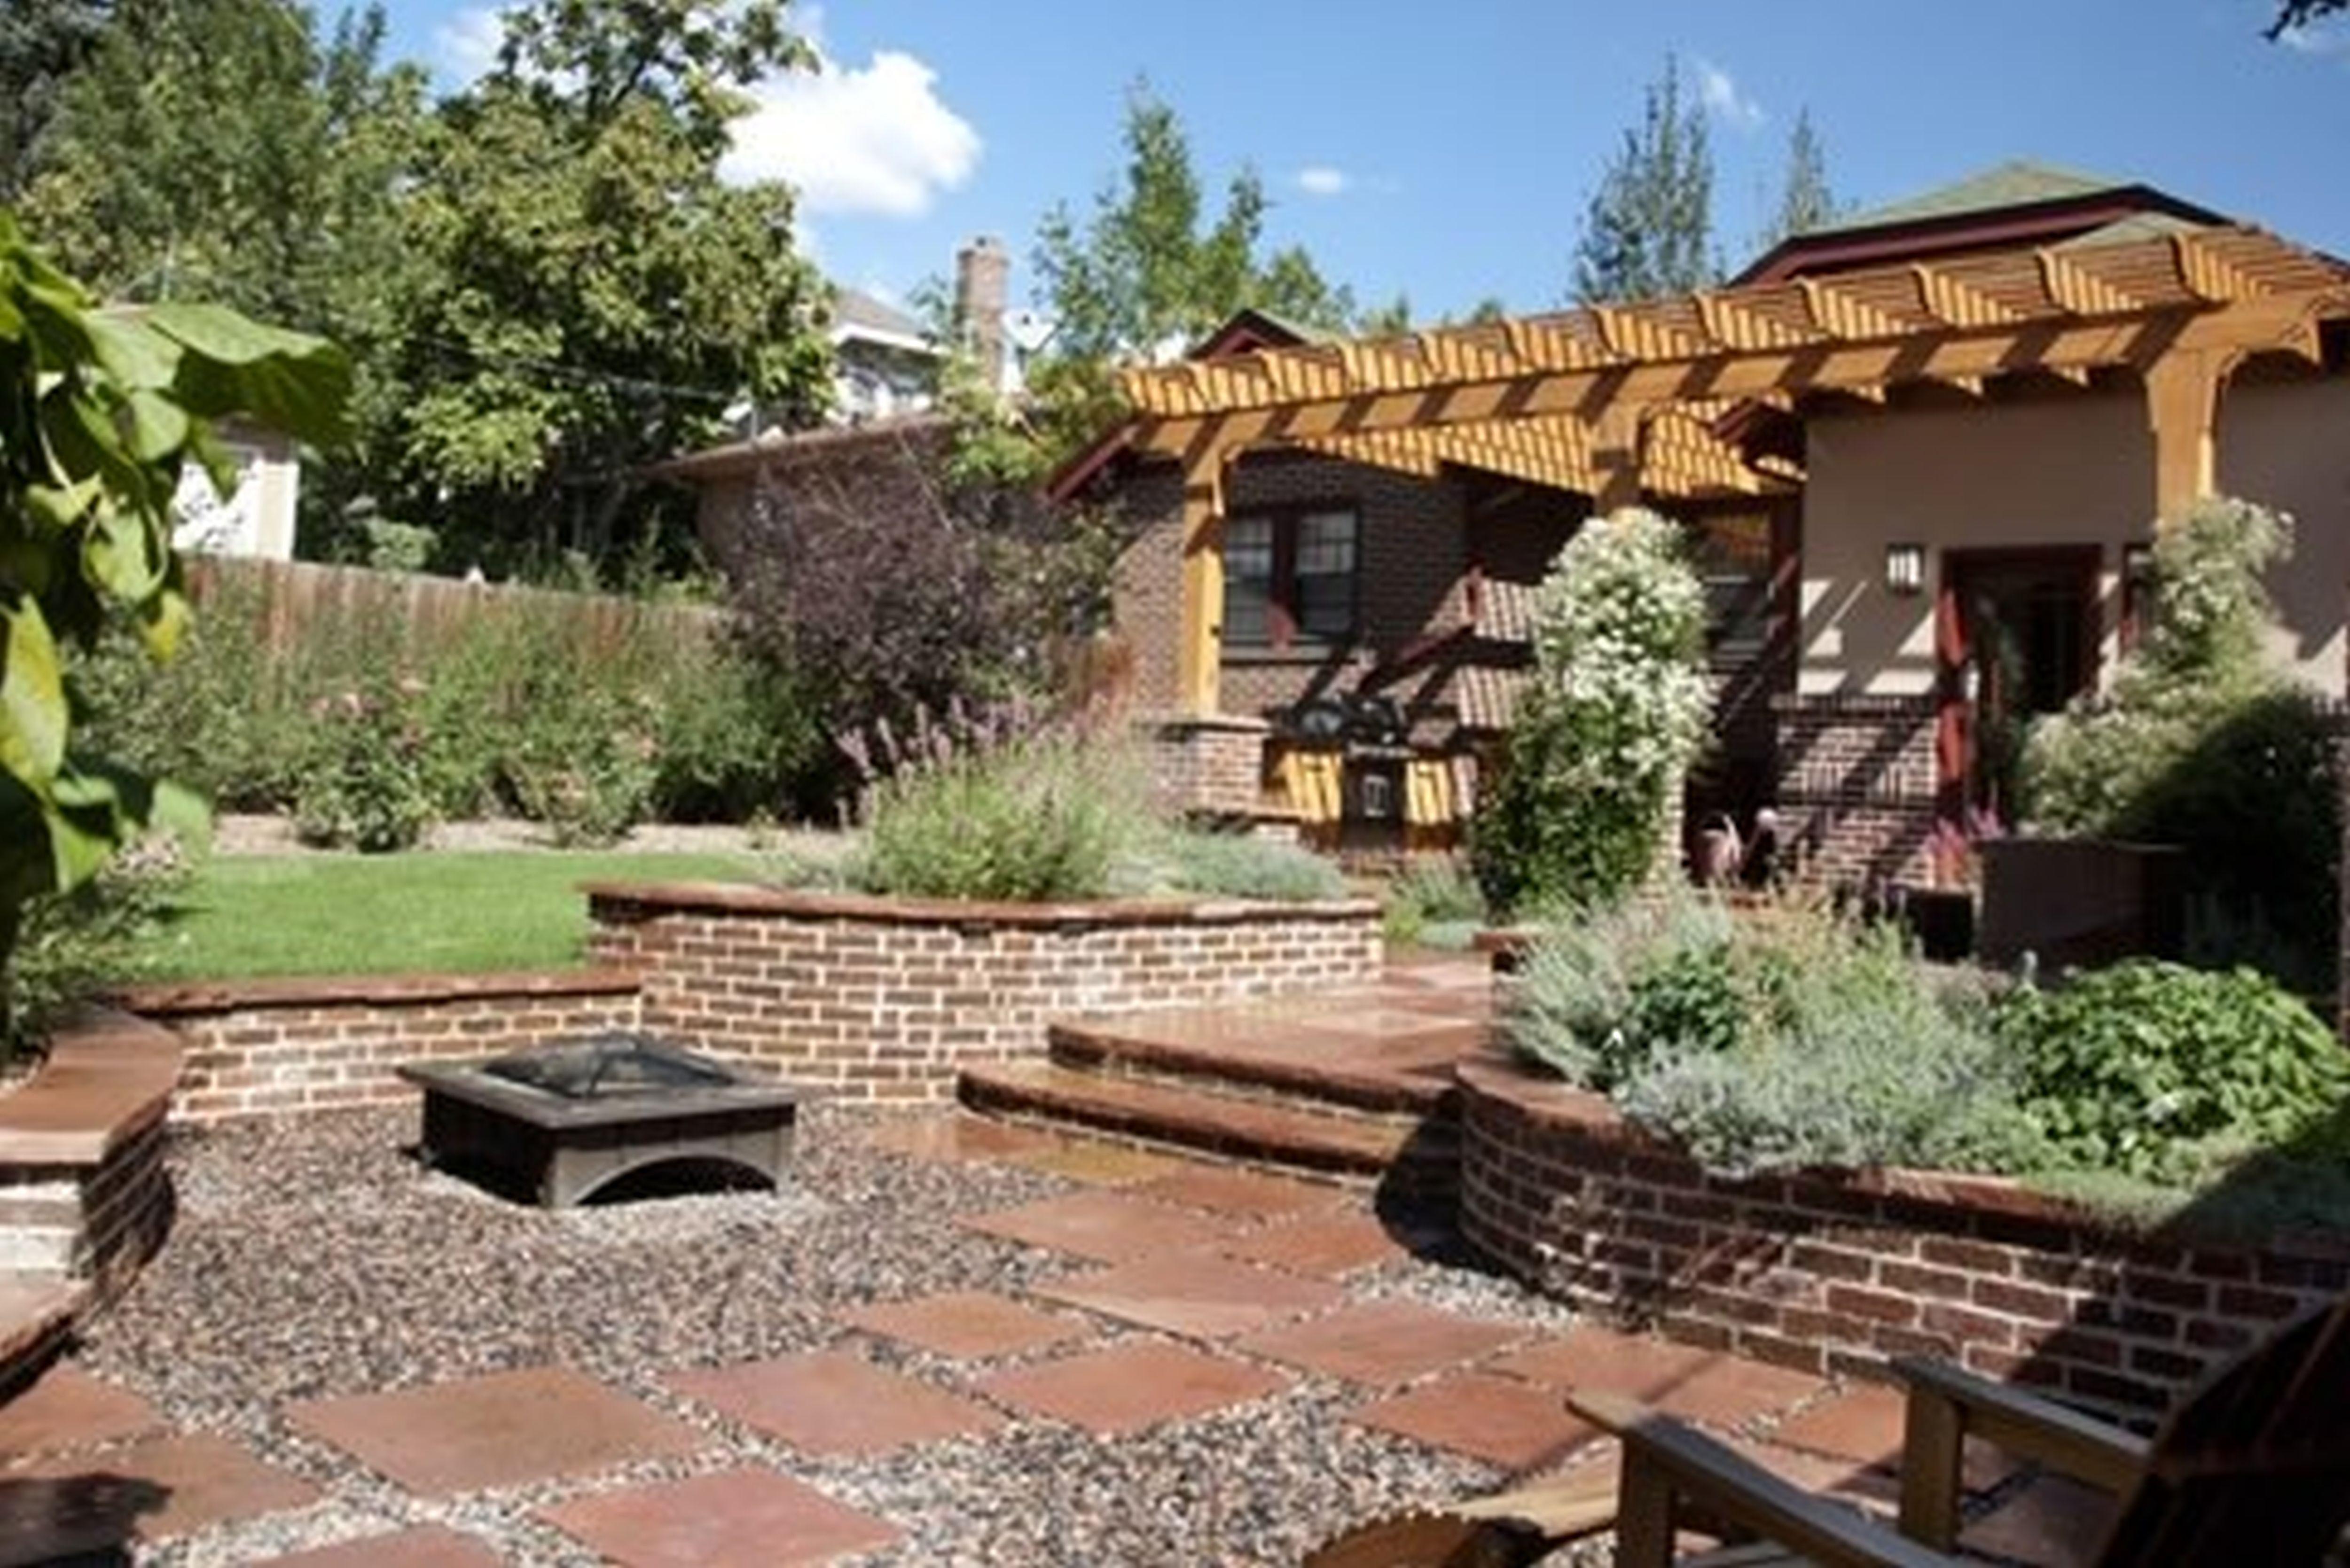 cover patio materials - Google Search | Yard | Pinterest | Landscape ...